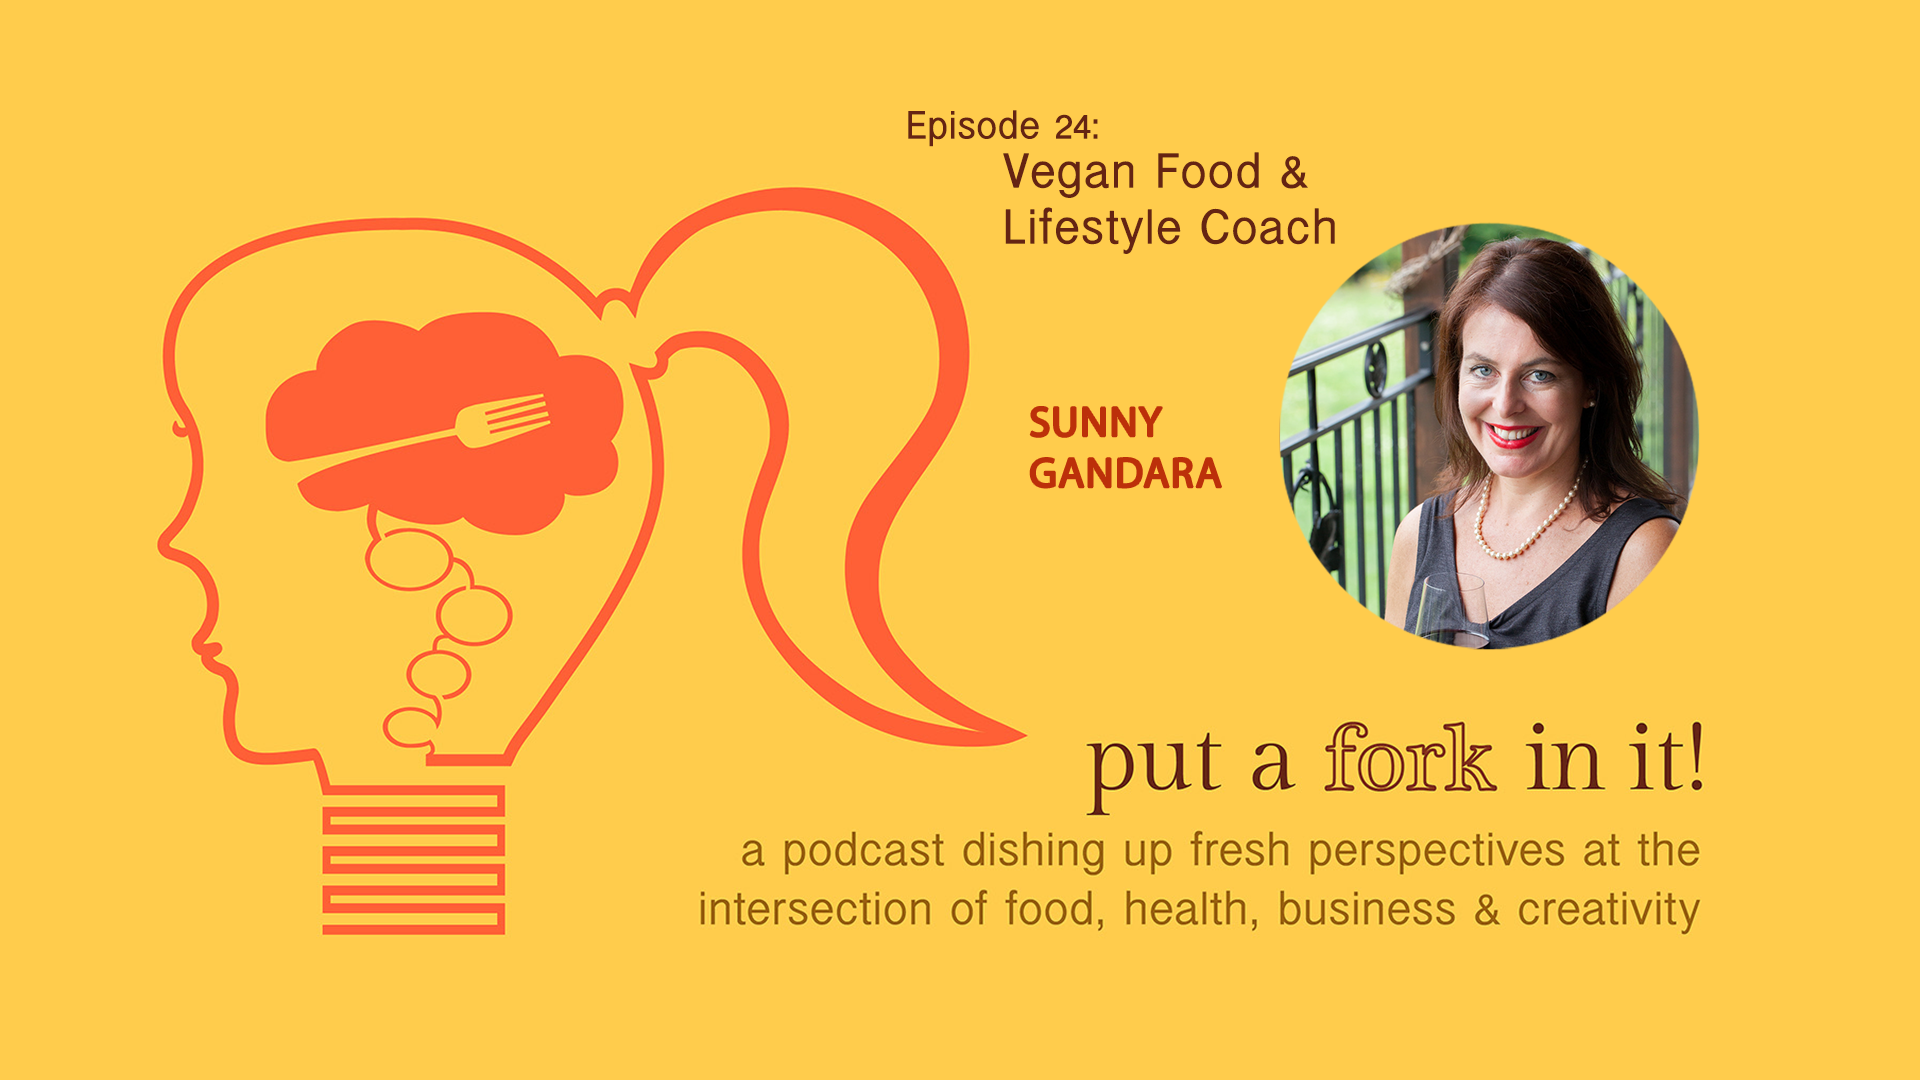 24: Sunny Gandara, vegan lifestyle consultant, blogger, entrepreneur